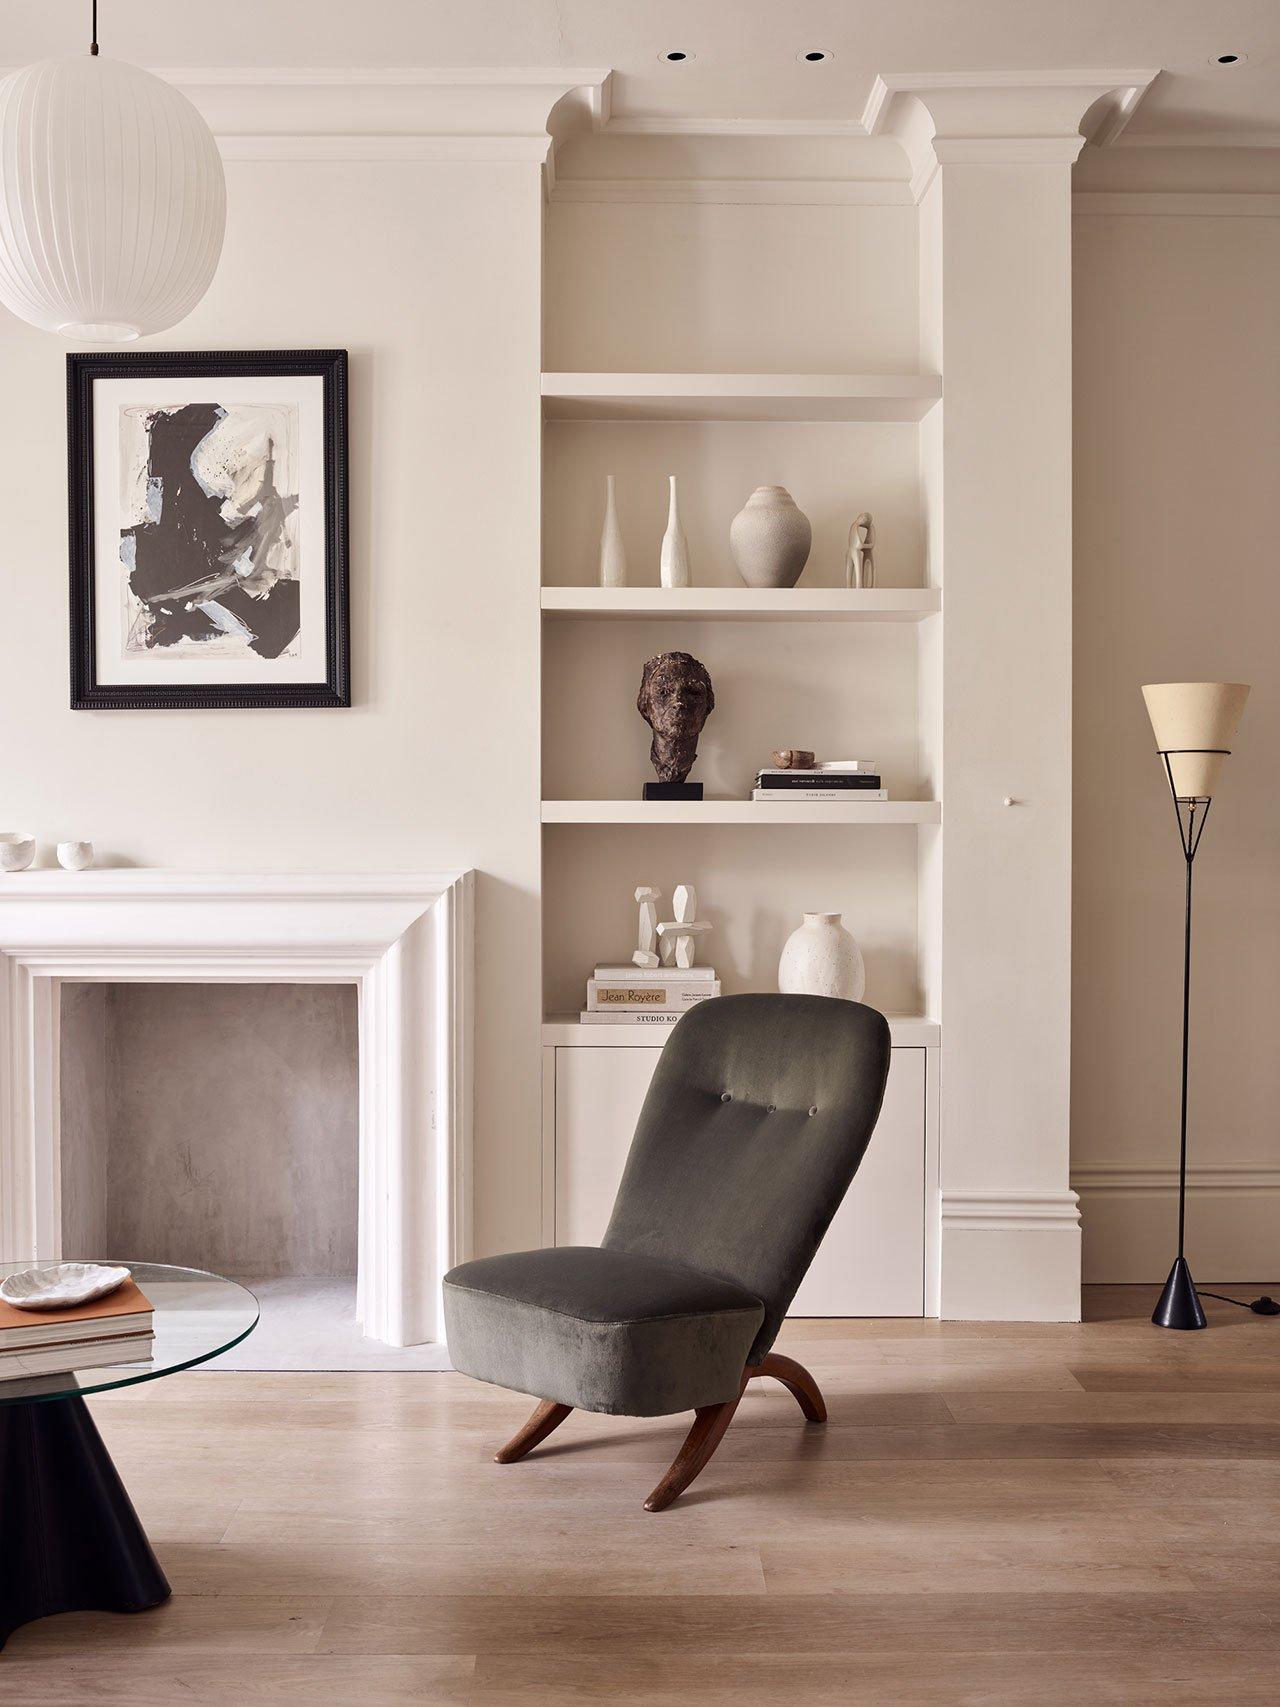 Daytrip Studio l 伦敦一栋维多利亚式联排屋改造